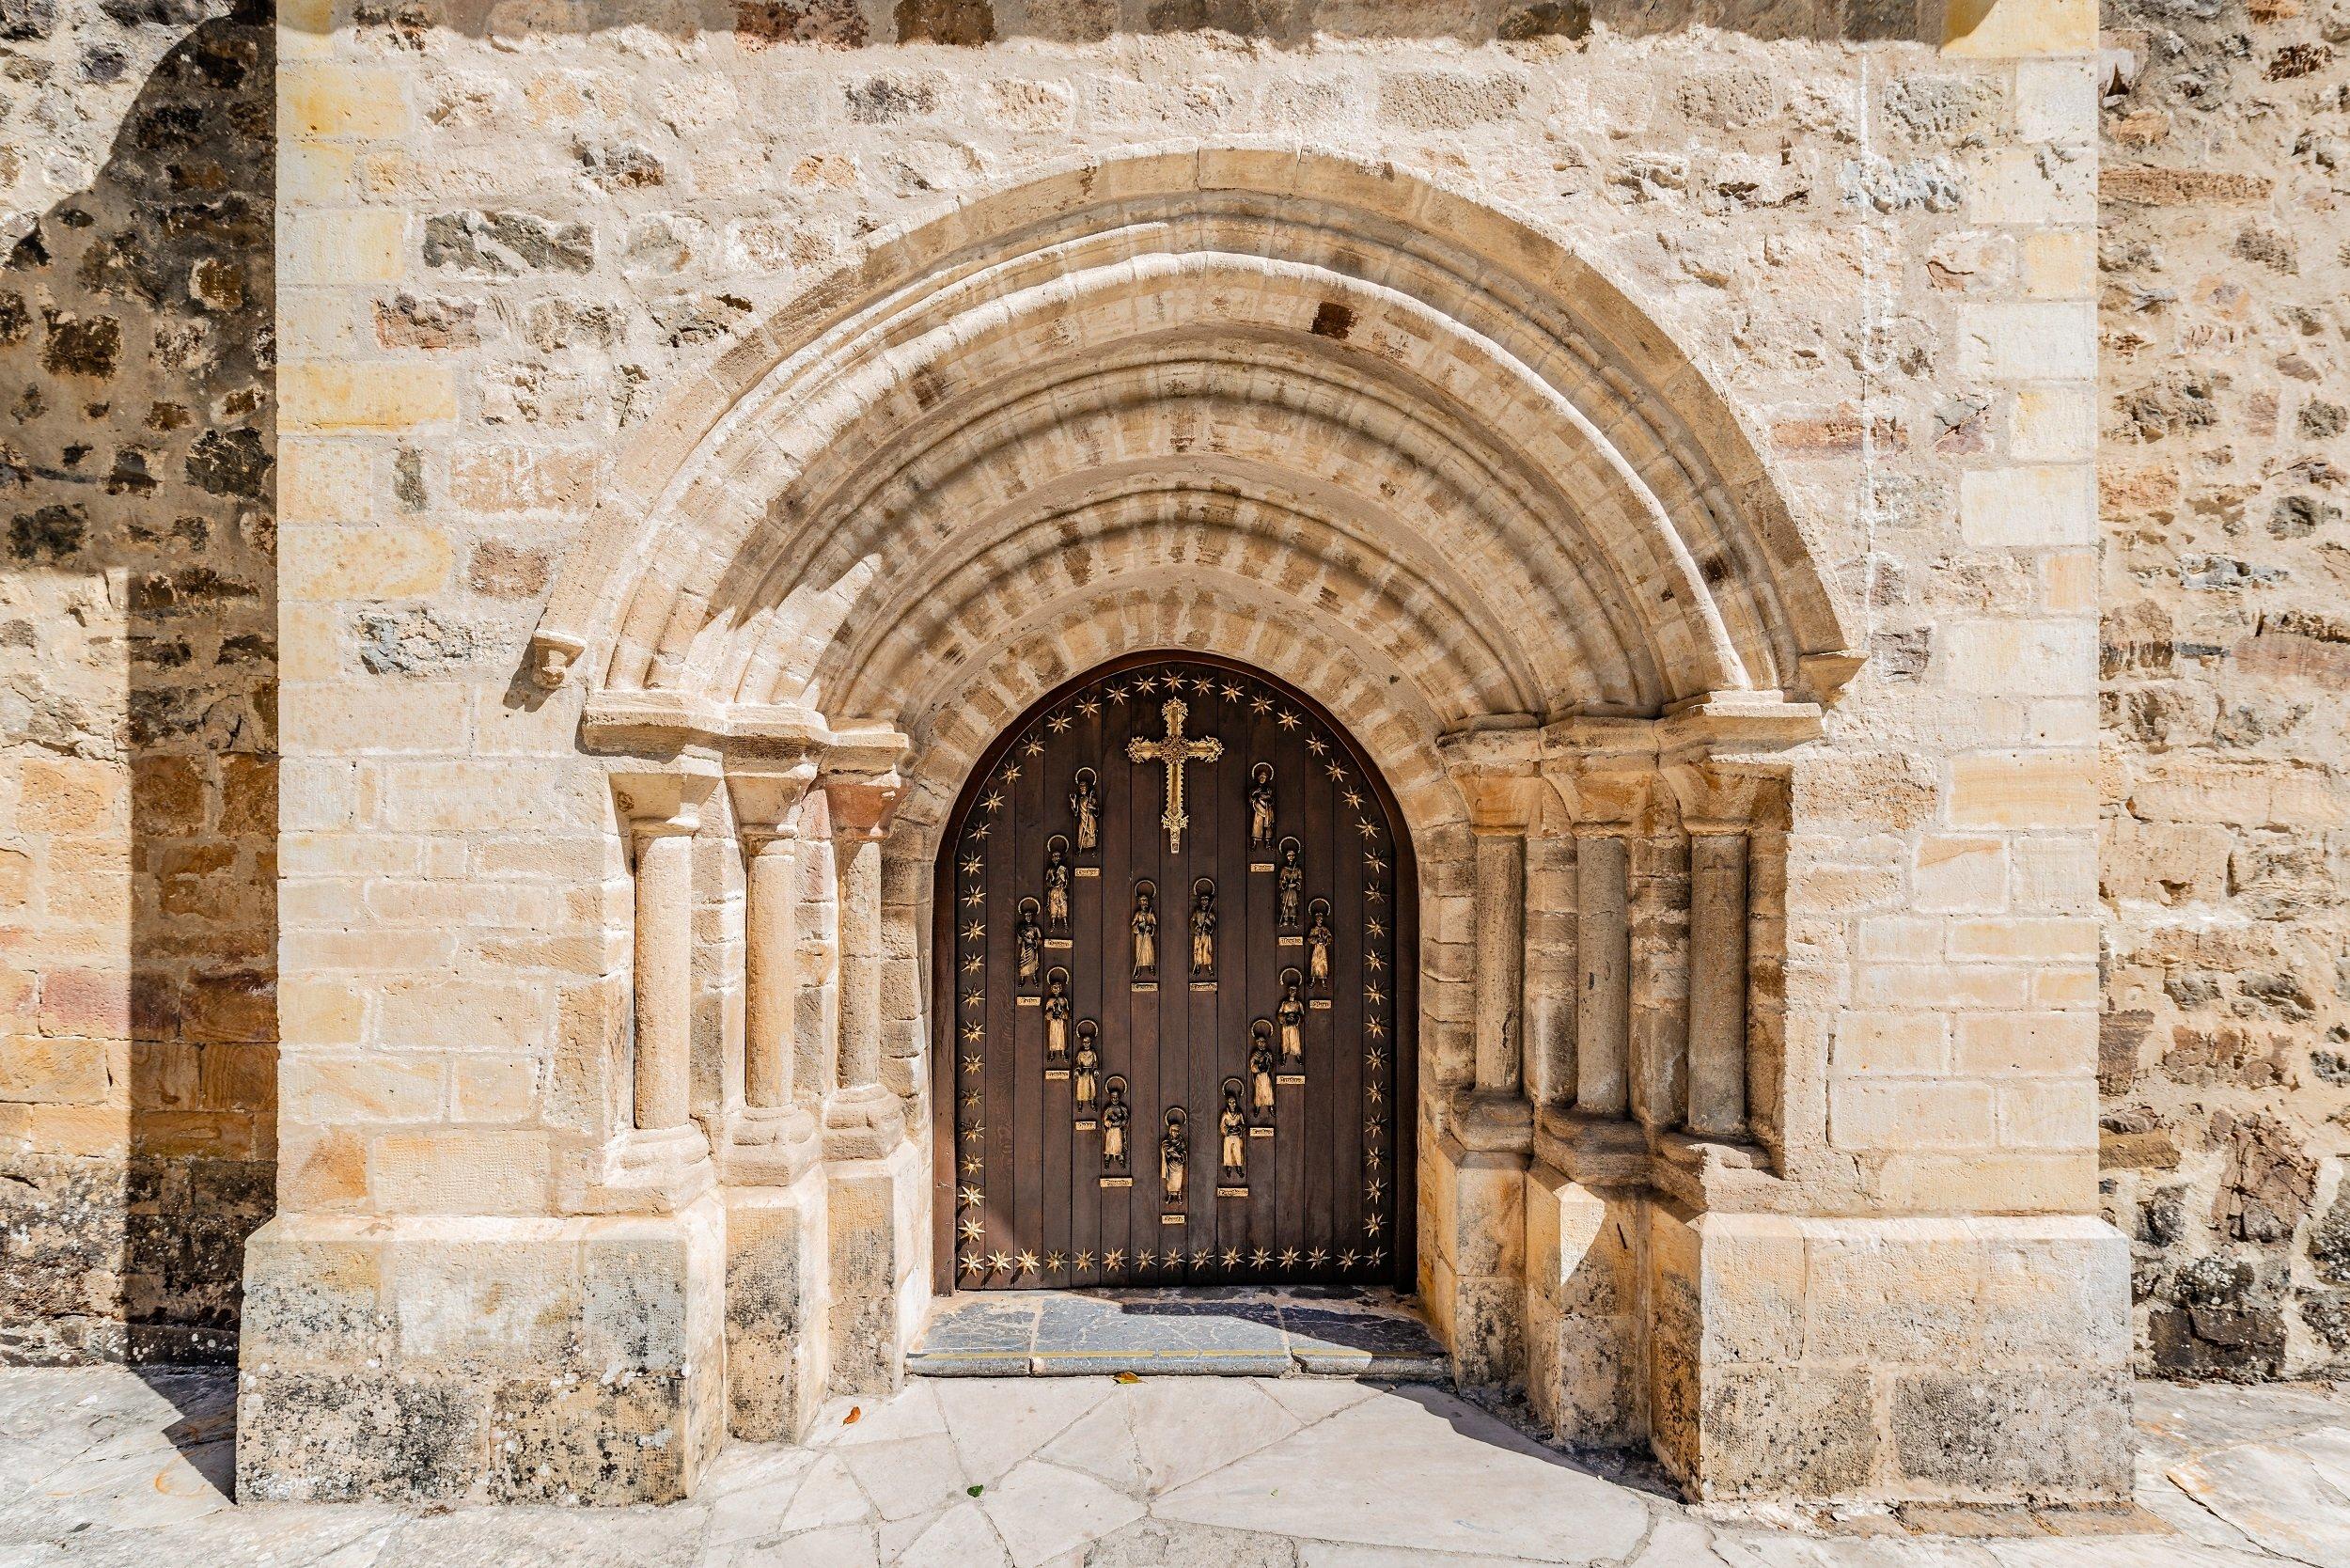 Monastery Of Santo Toribio & San Sebastián De Garabandal Pilgrimage Tour From Santander, Torrelavega & Unquera_1